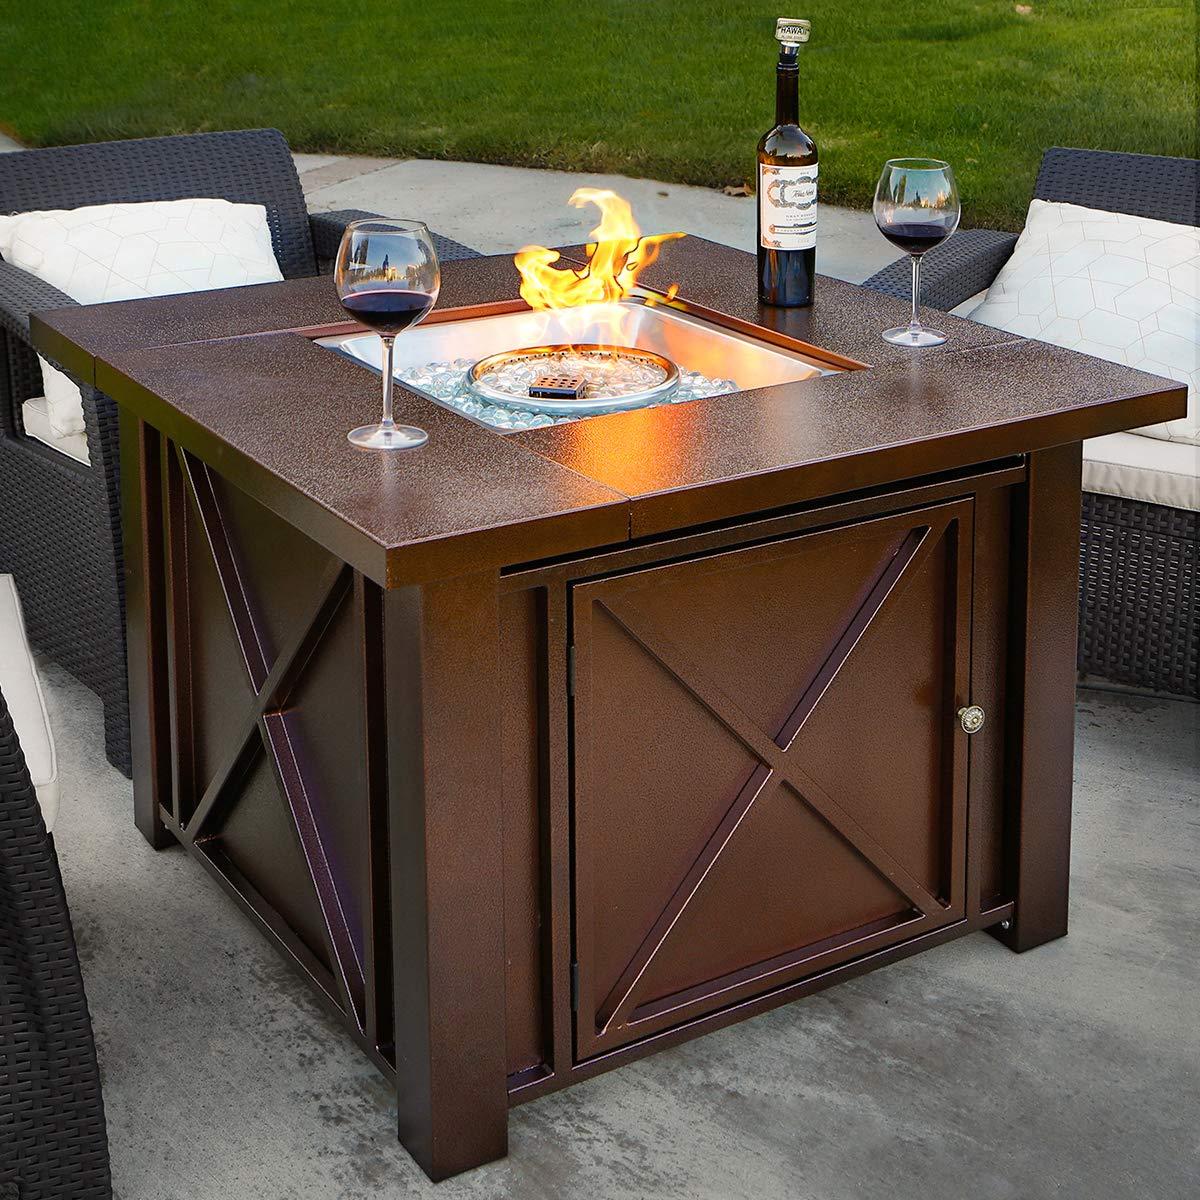 Amazon com xtremepowerus out door patio heaters lpg propane fire pit table hammered bronze steel finish deluxe garden outdoor